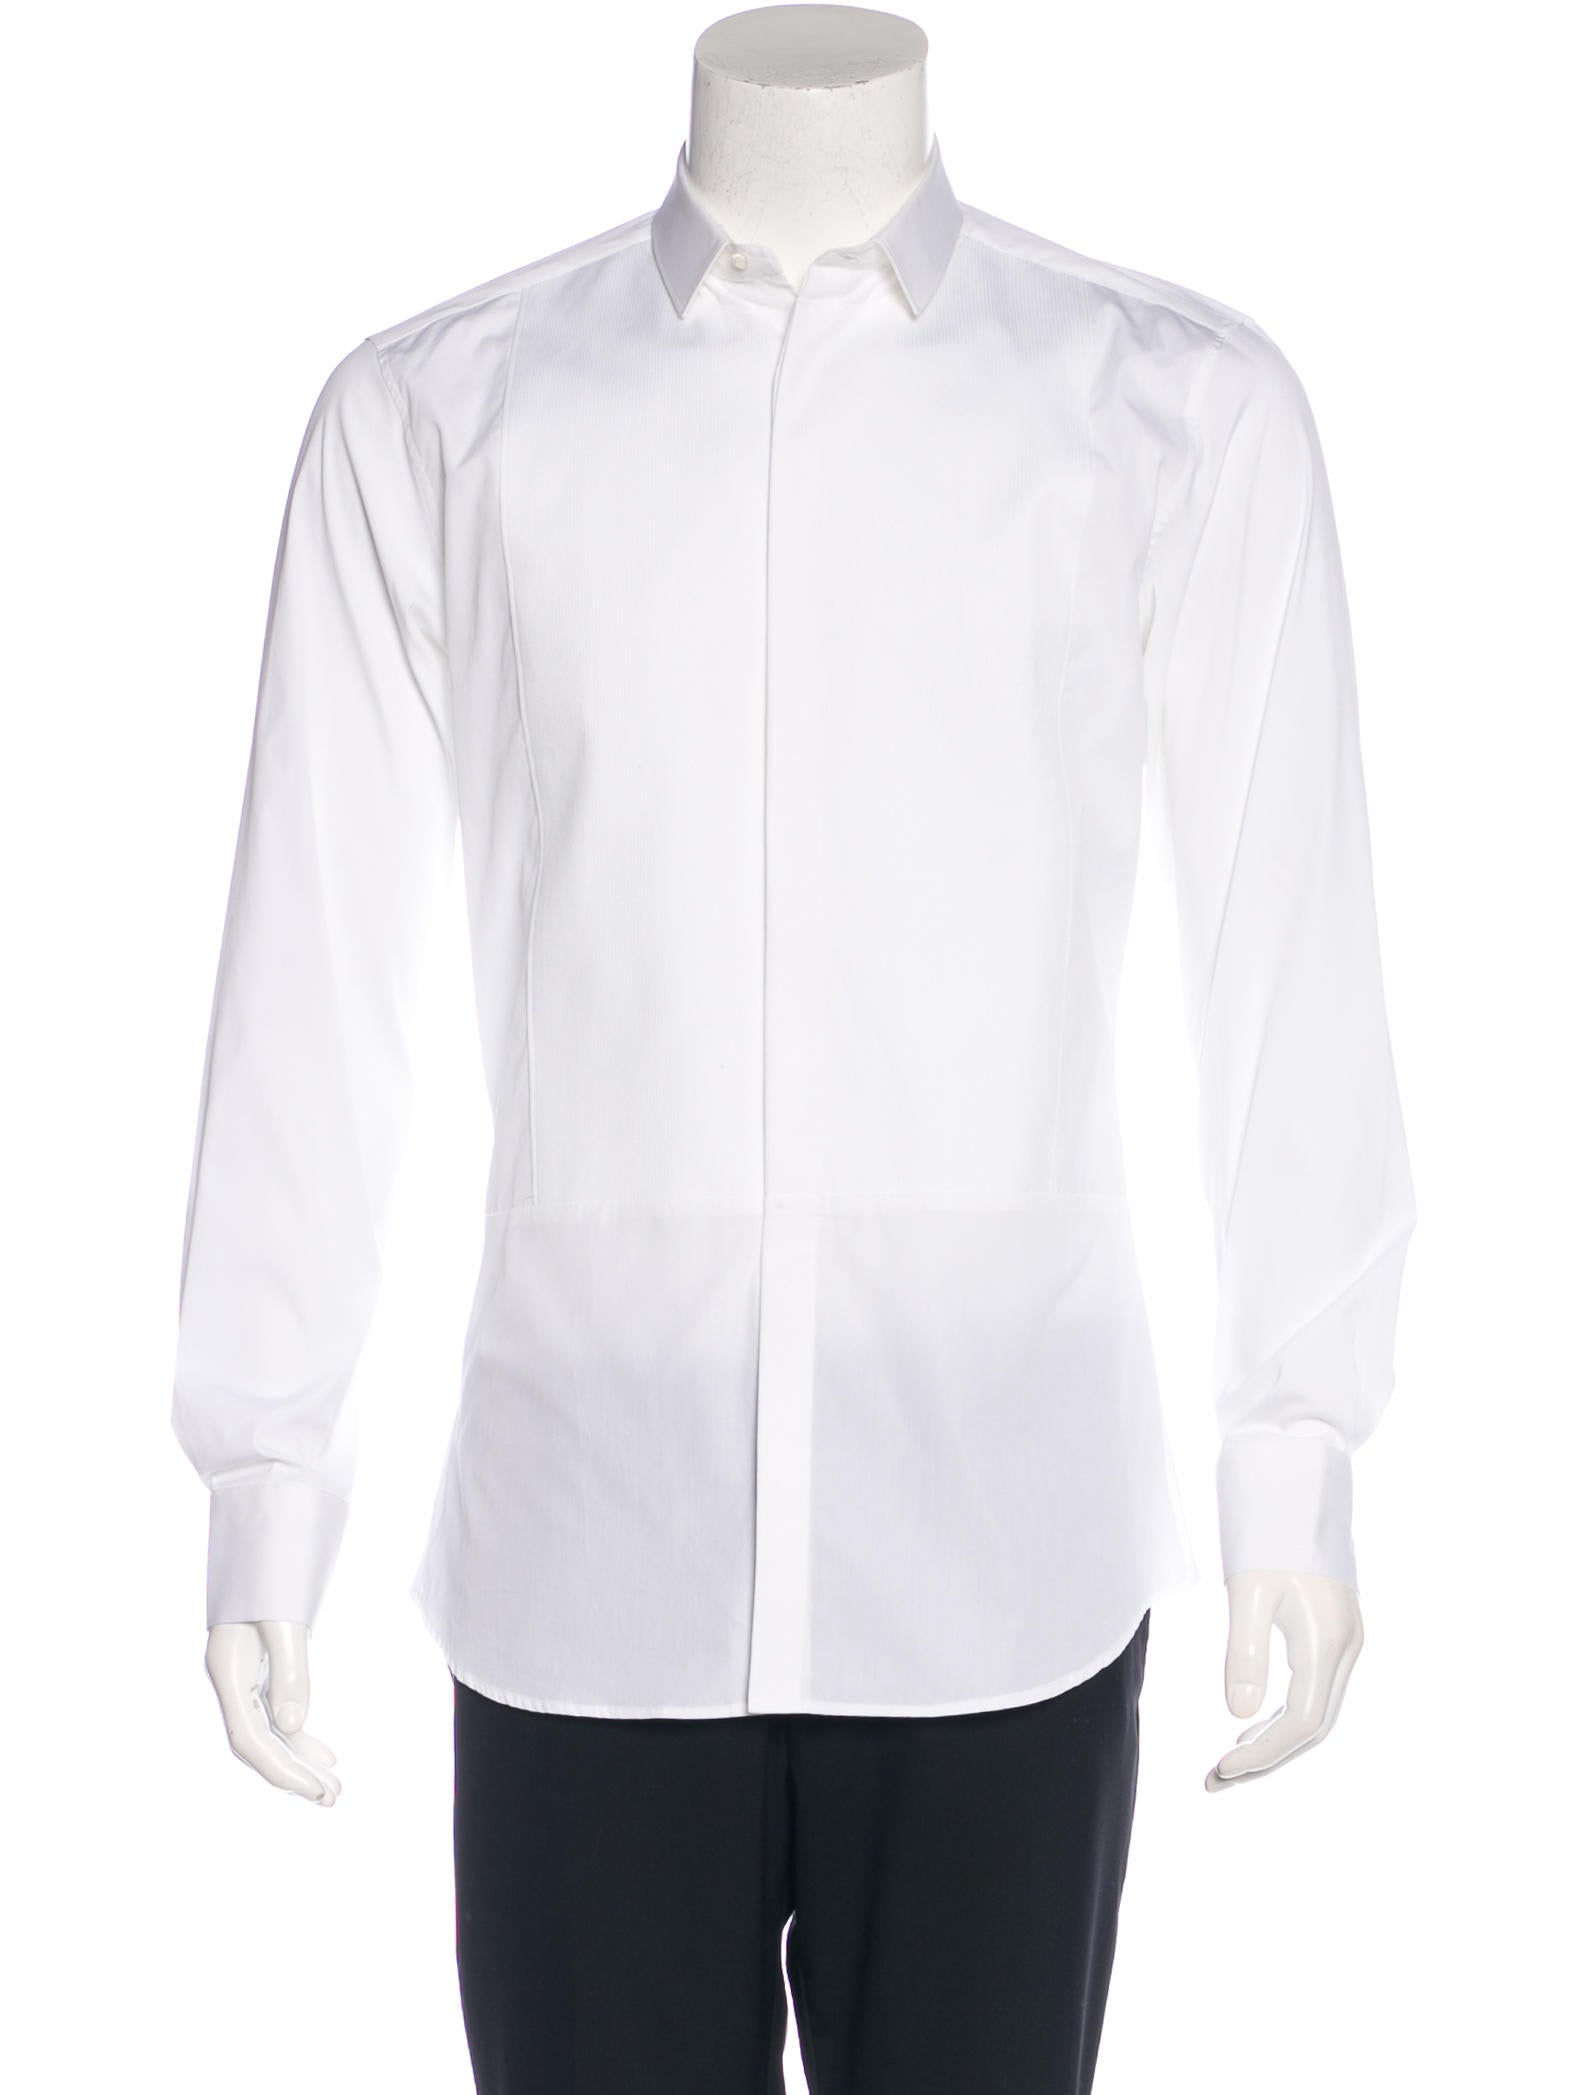 Neil barrett skinny fit tuxedo shirt clothing neb21382 for Neil barrett tuxedo shirt